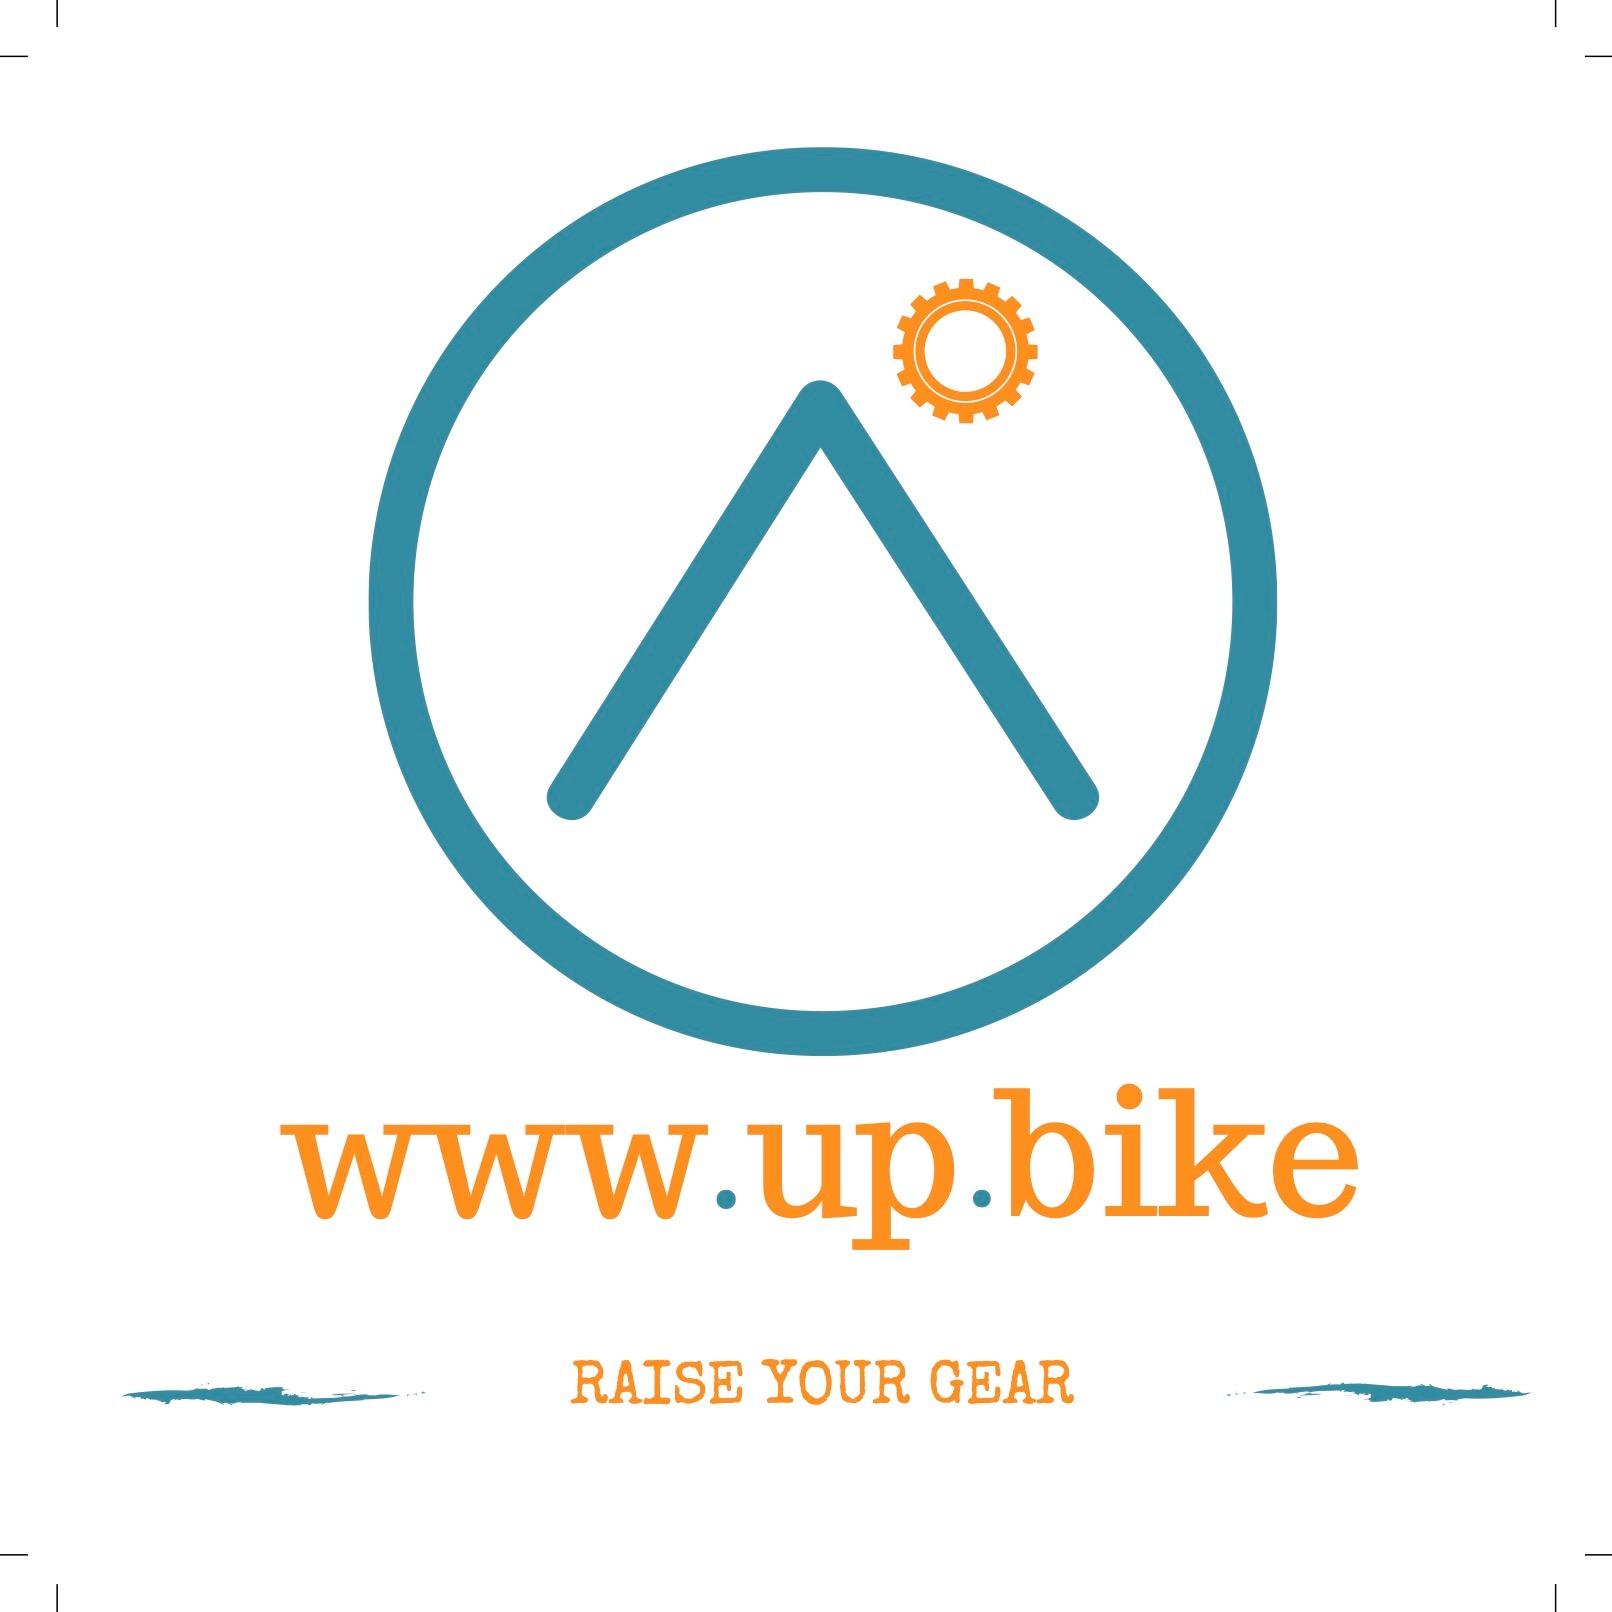 Up.Bike   Raise Your Gear